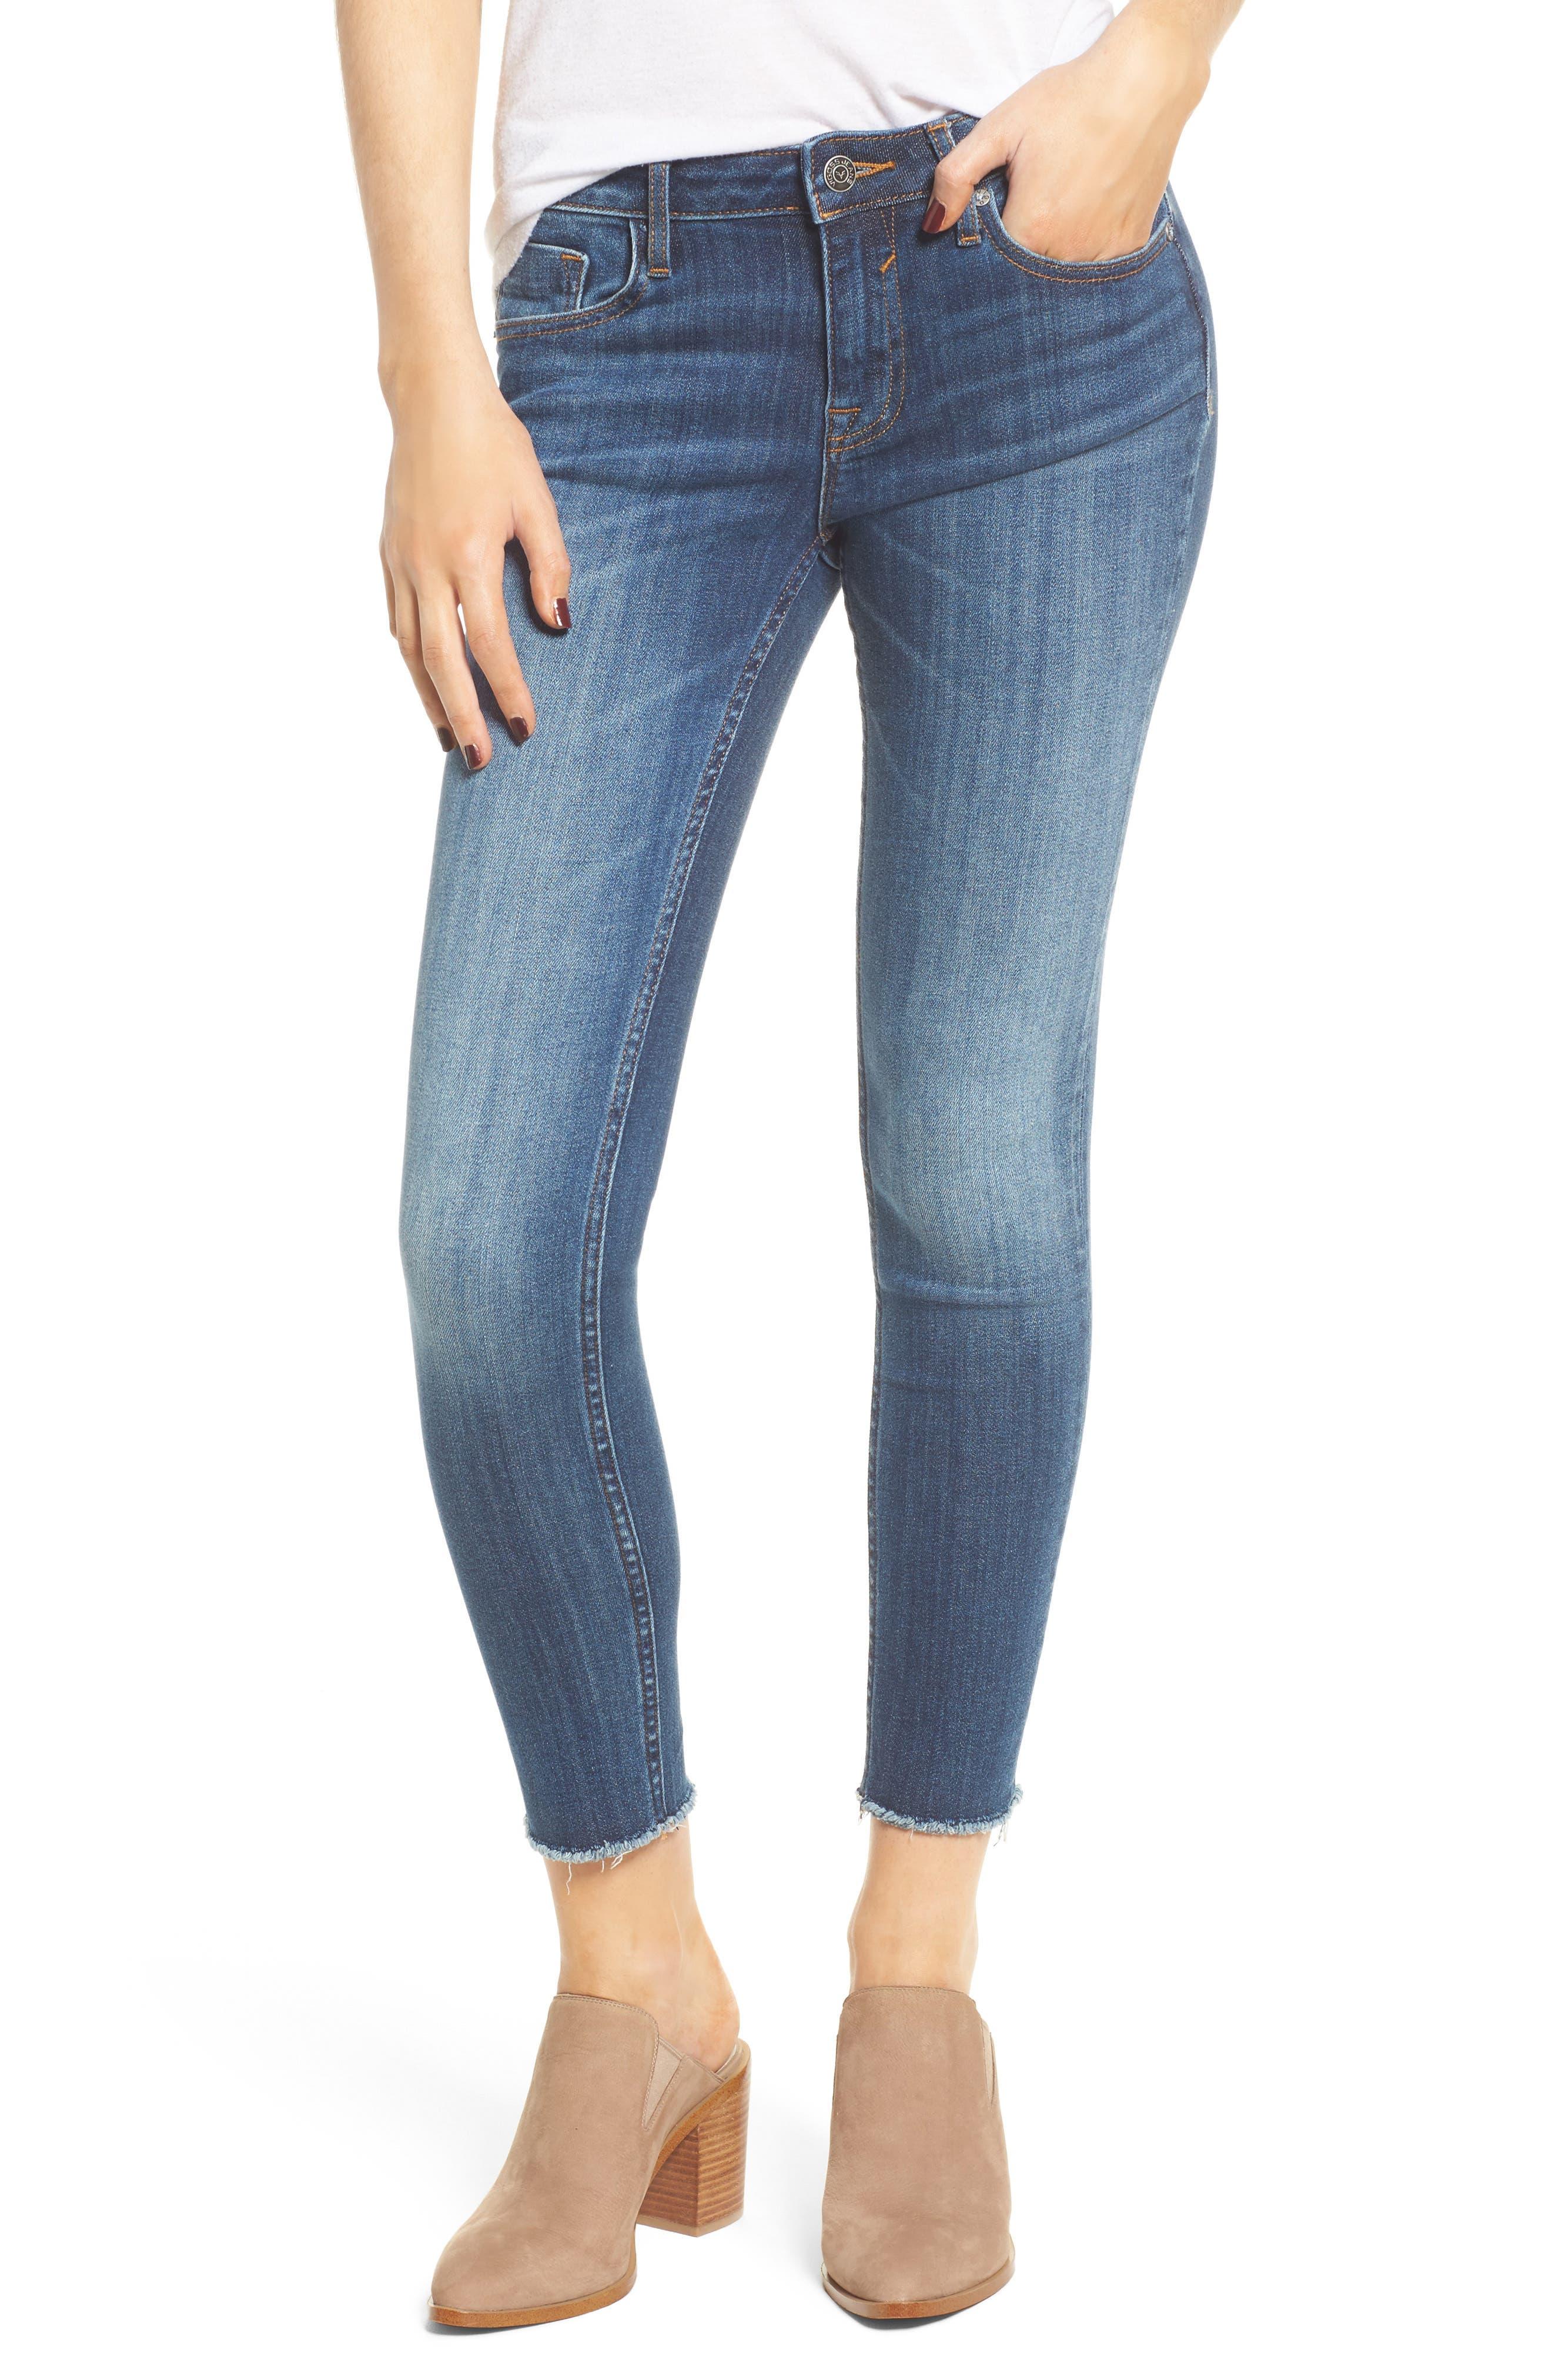 Main Image - Vigoss Jagger Mid-Rise Skinny Jeans (Medium Wash)